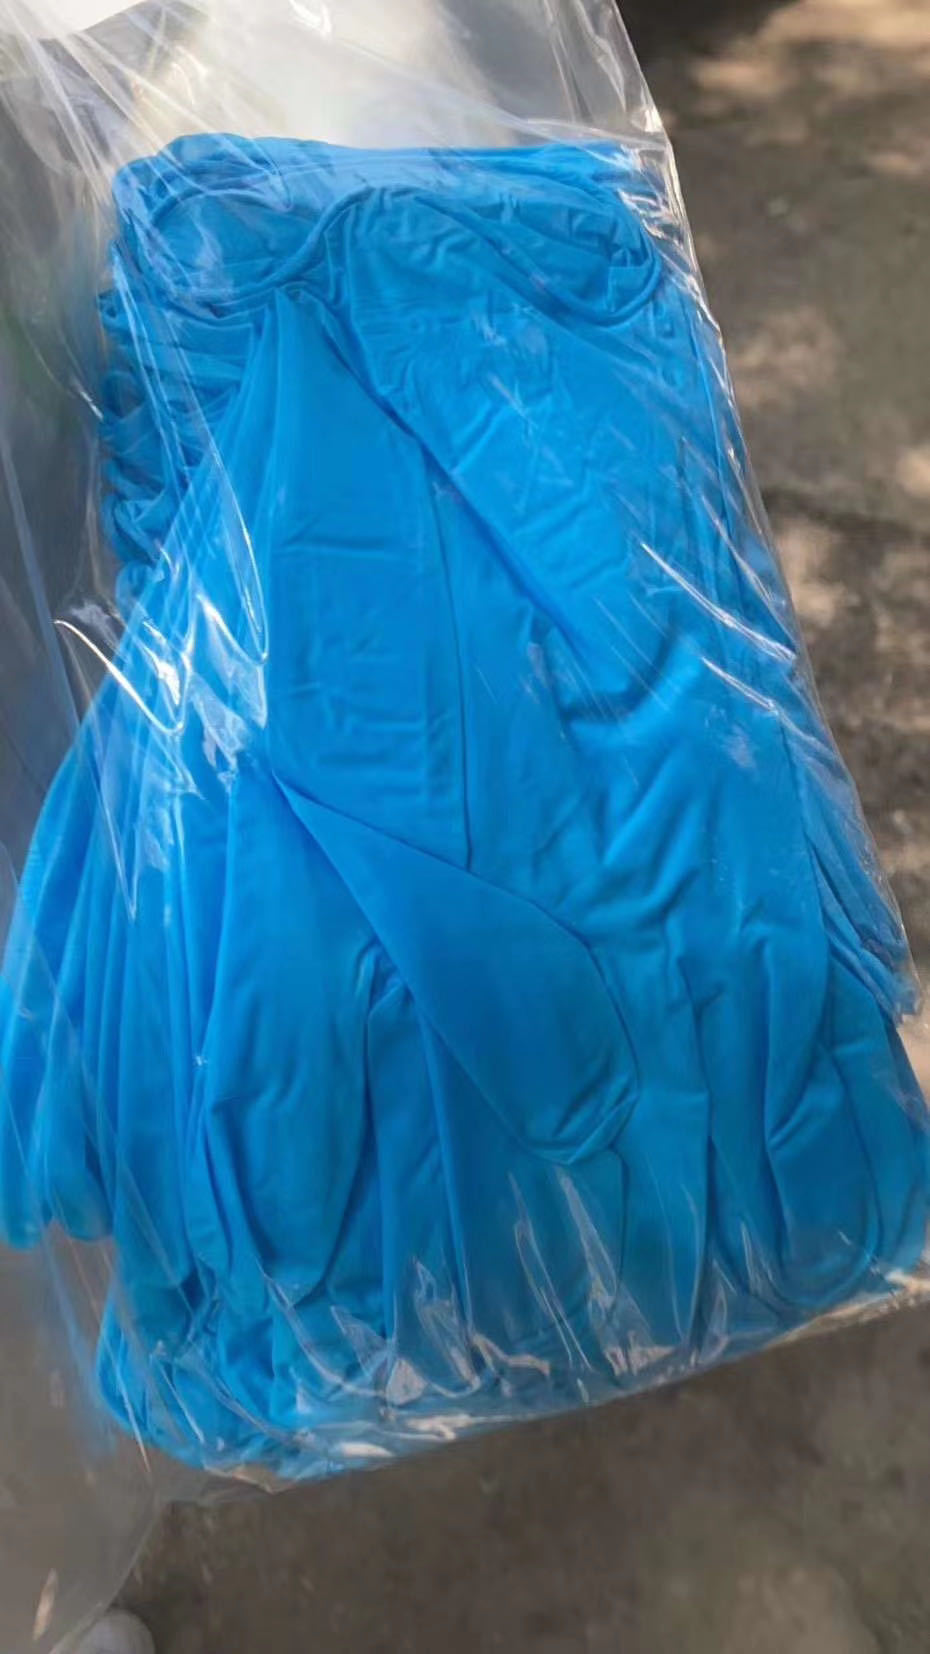 Honray medical nitrile powder free gloves